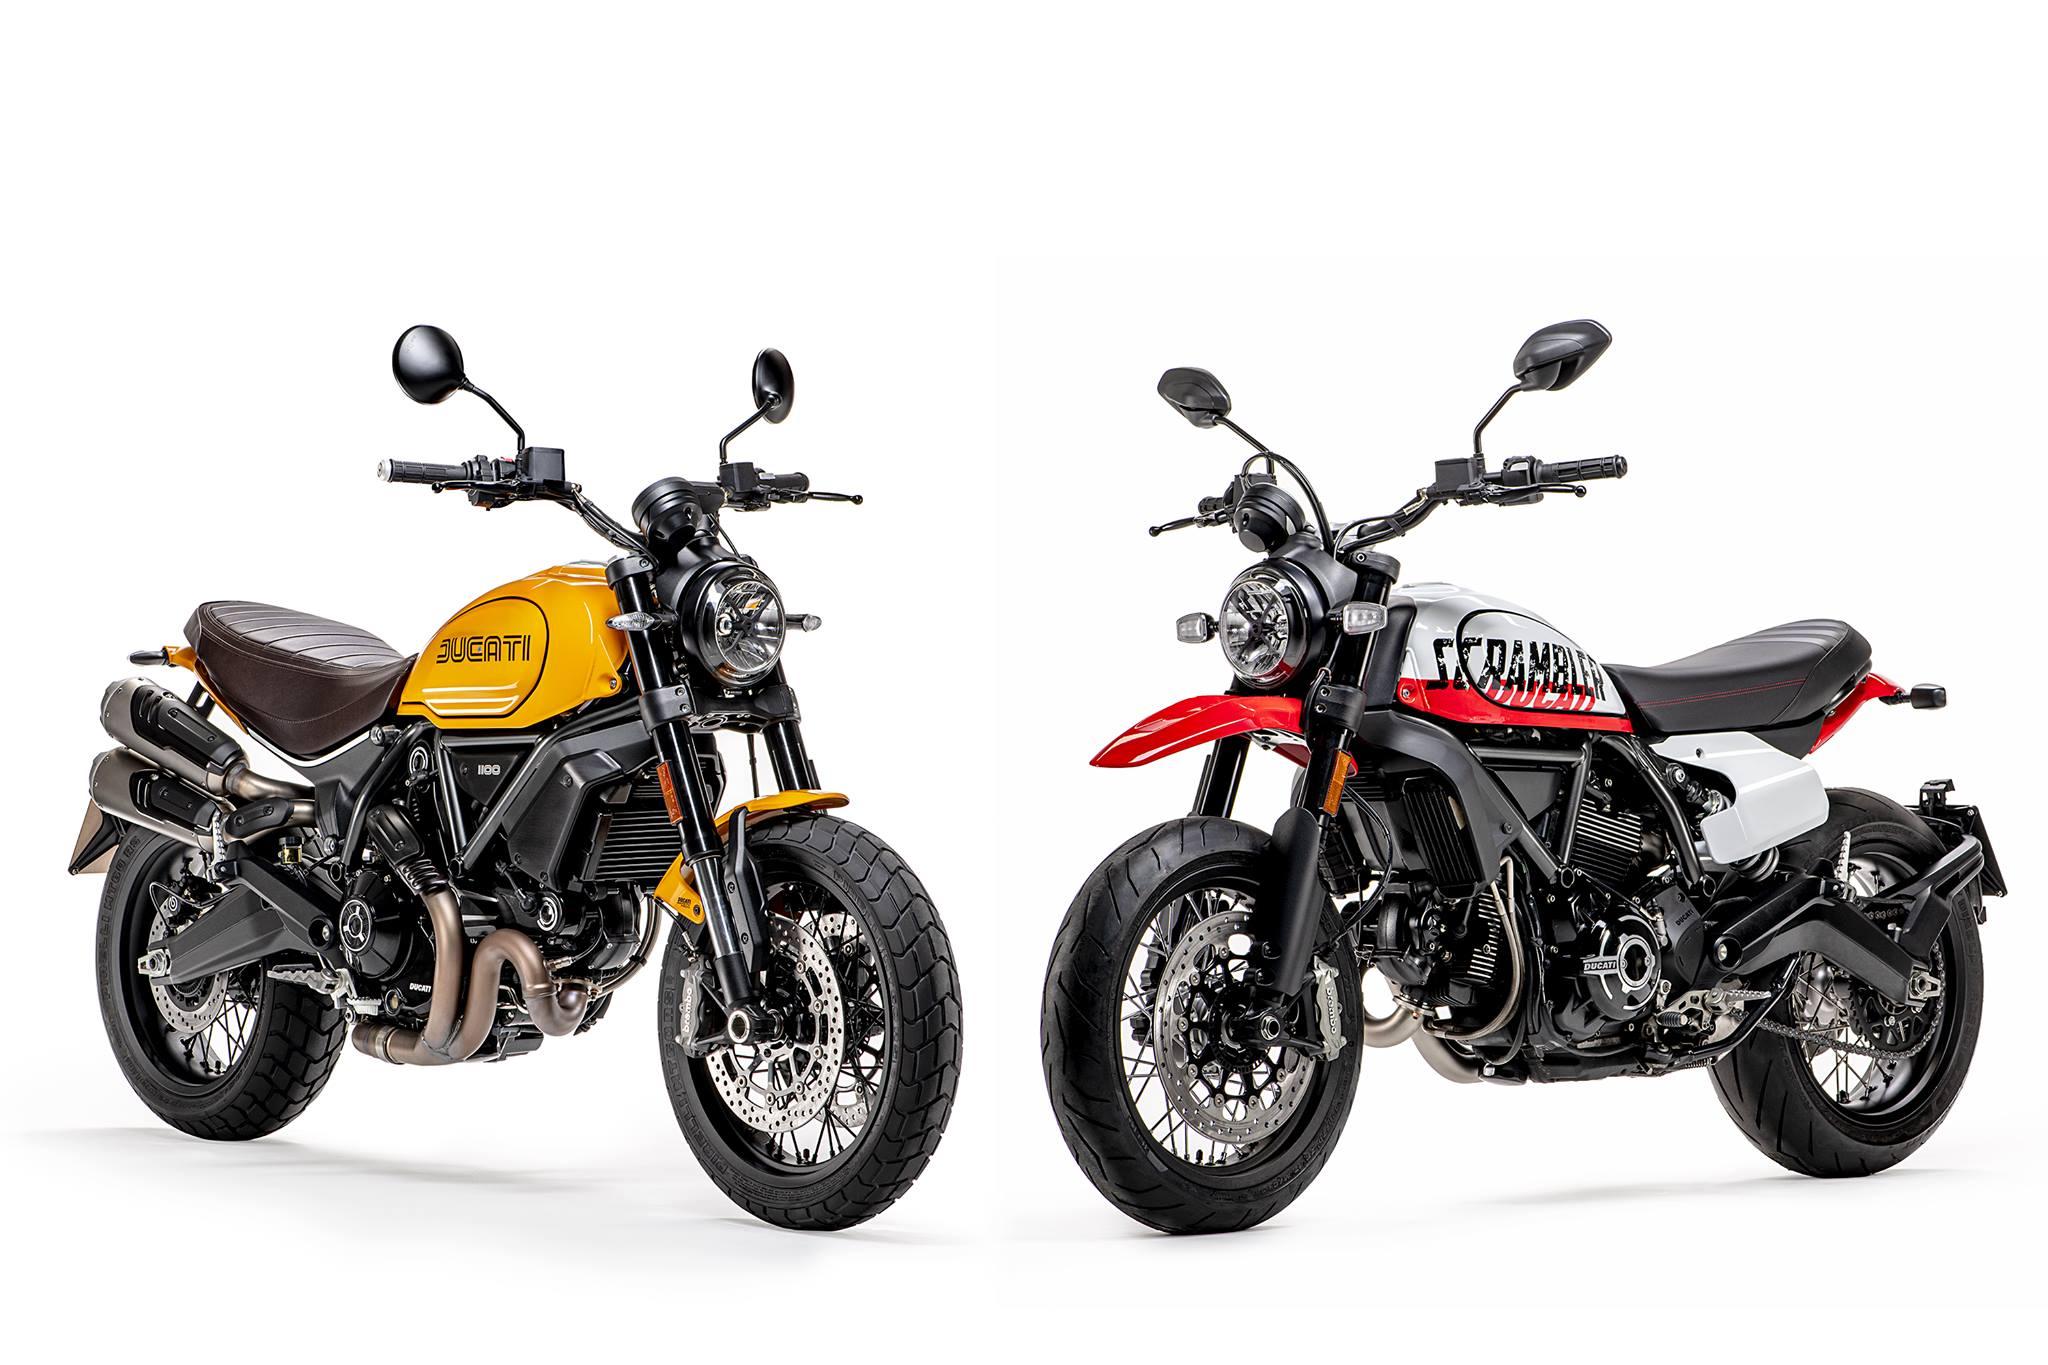 Novos modelos Ducati Scrambler para 2022